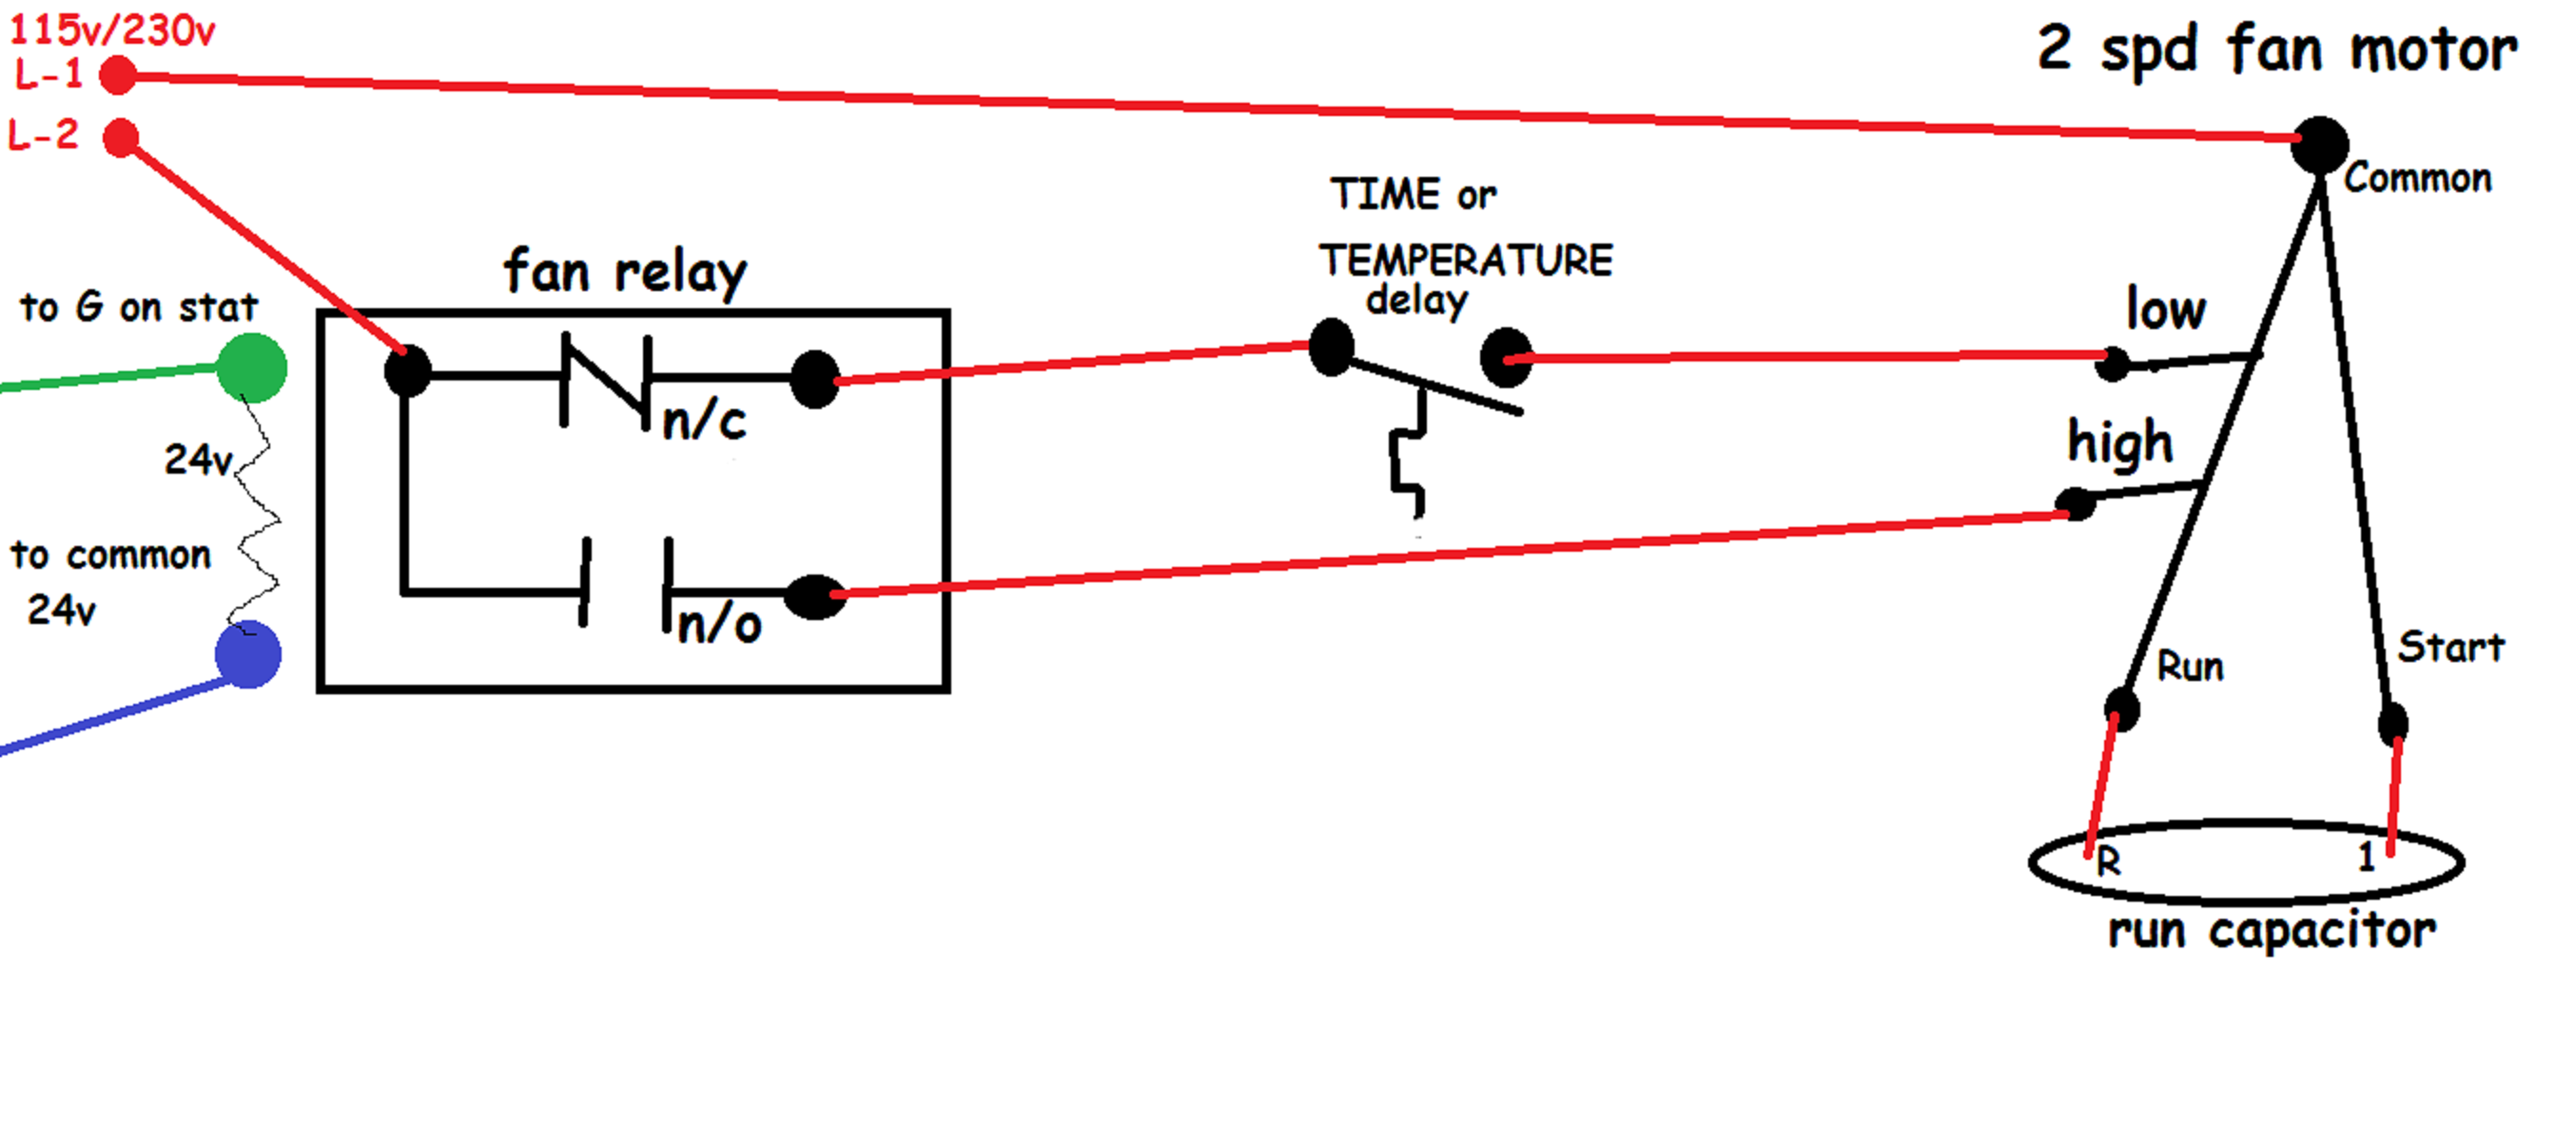 unique fan relay wiring diagram hvac diagram diagramsampleunique fan relay wiring diagram hvac diagram diagramsample diagramtemplate [ 2708 x 1188 Pixel ]